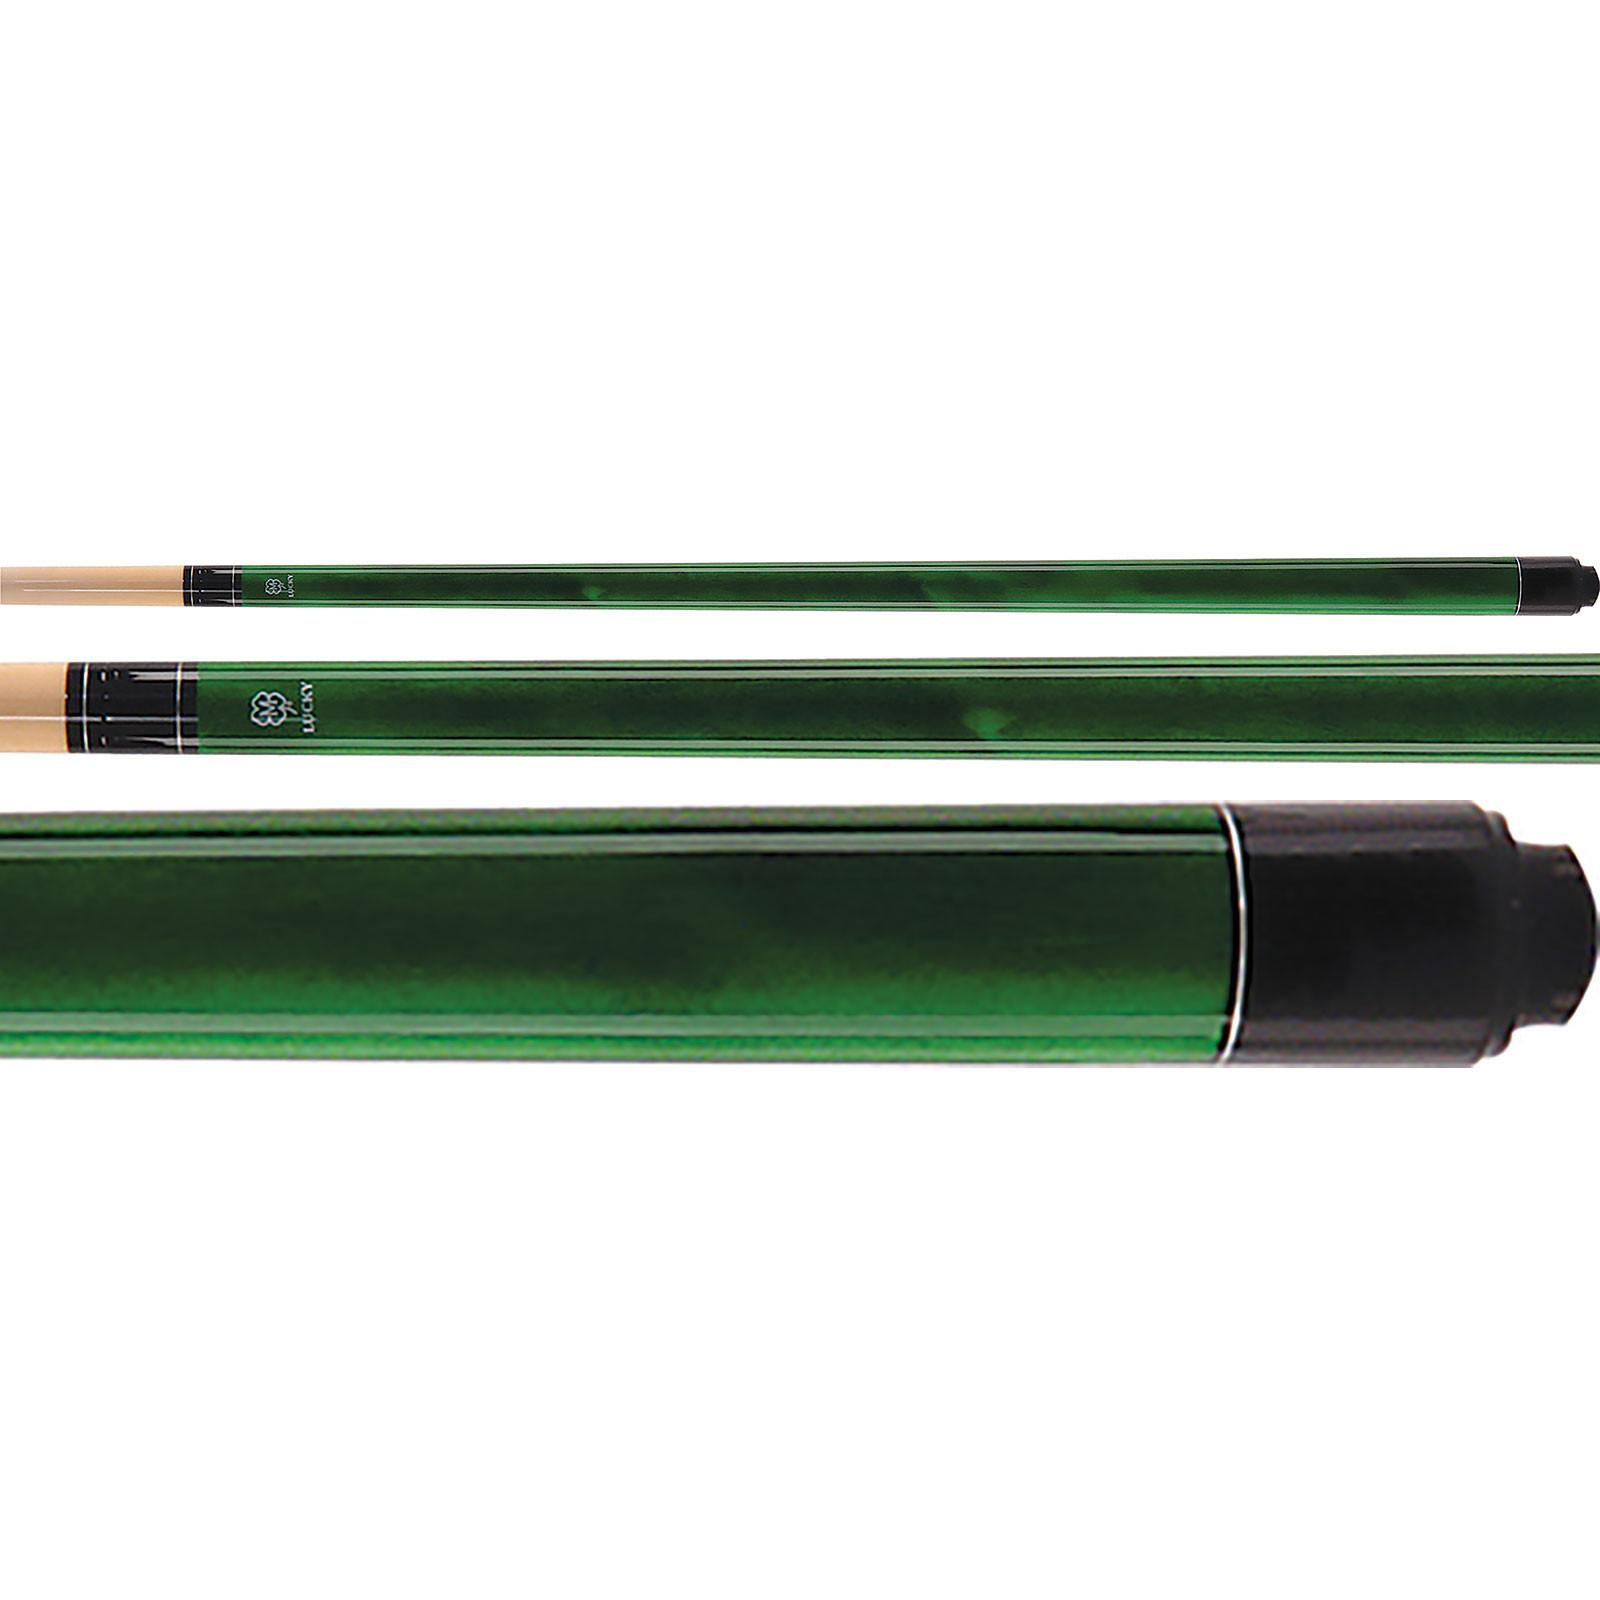 McDermott Lucky Pool Cue, L3, Green